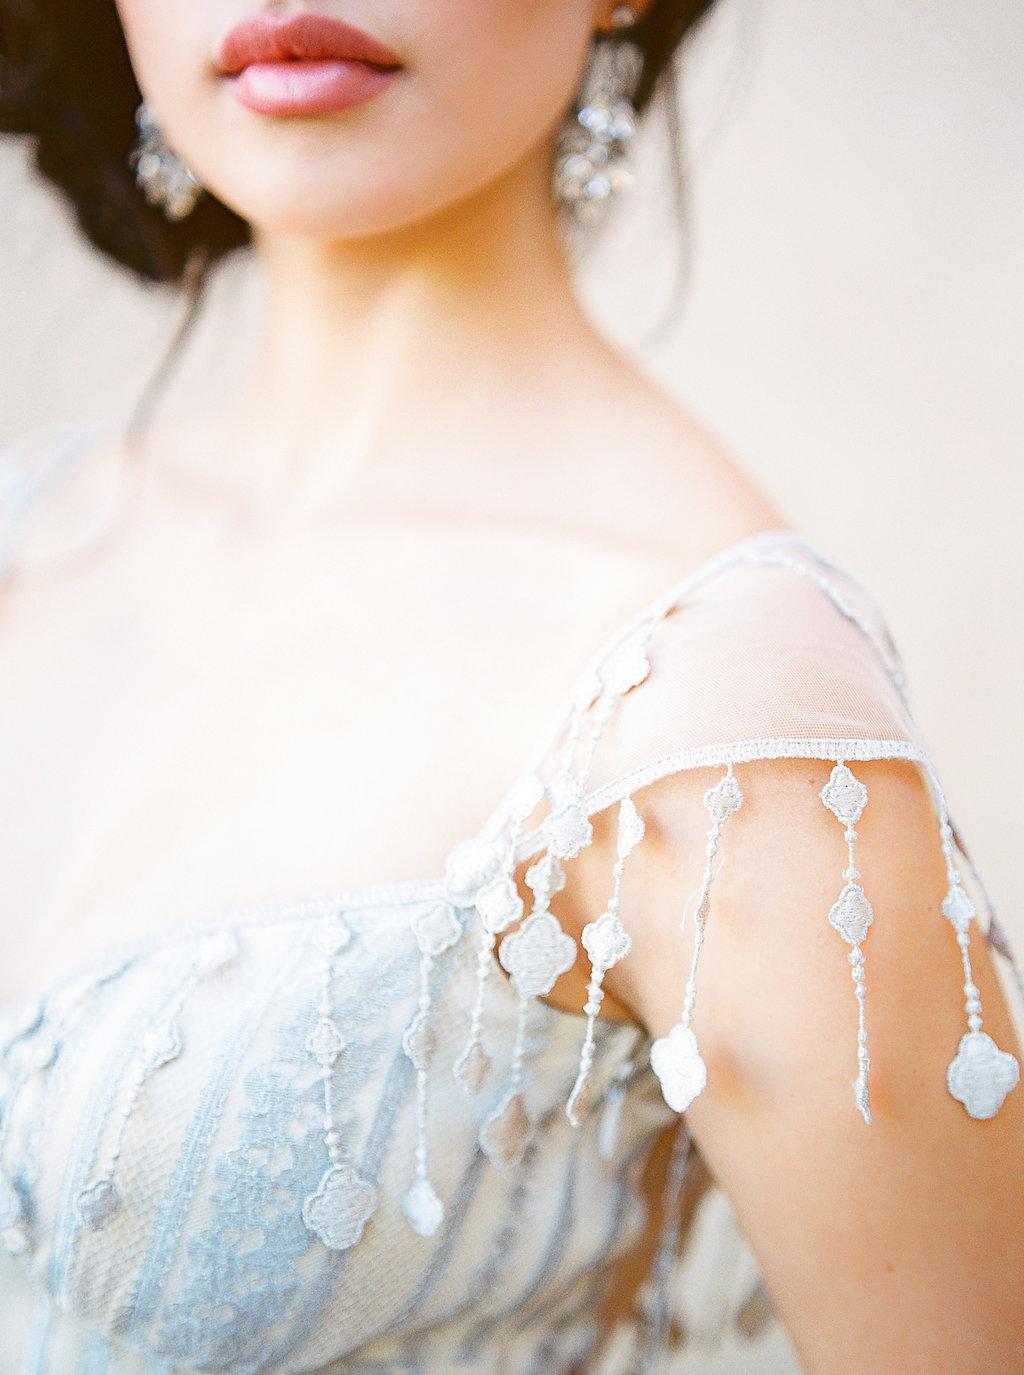 Paso Robles California - Allegretto Resort and Vineyards - Bridal Session - fine art film photographer Tanja Kibogo14.JPG